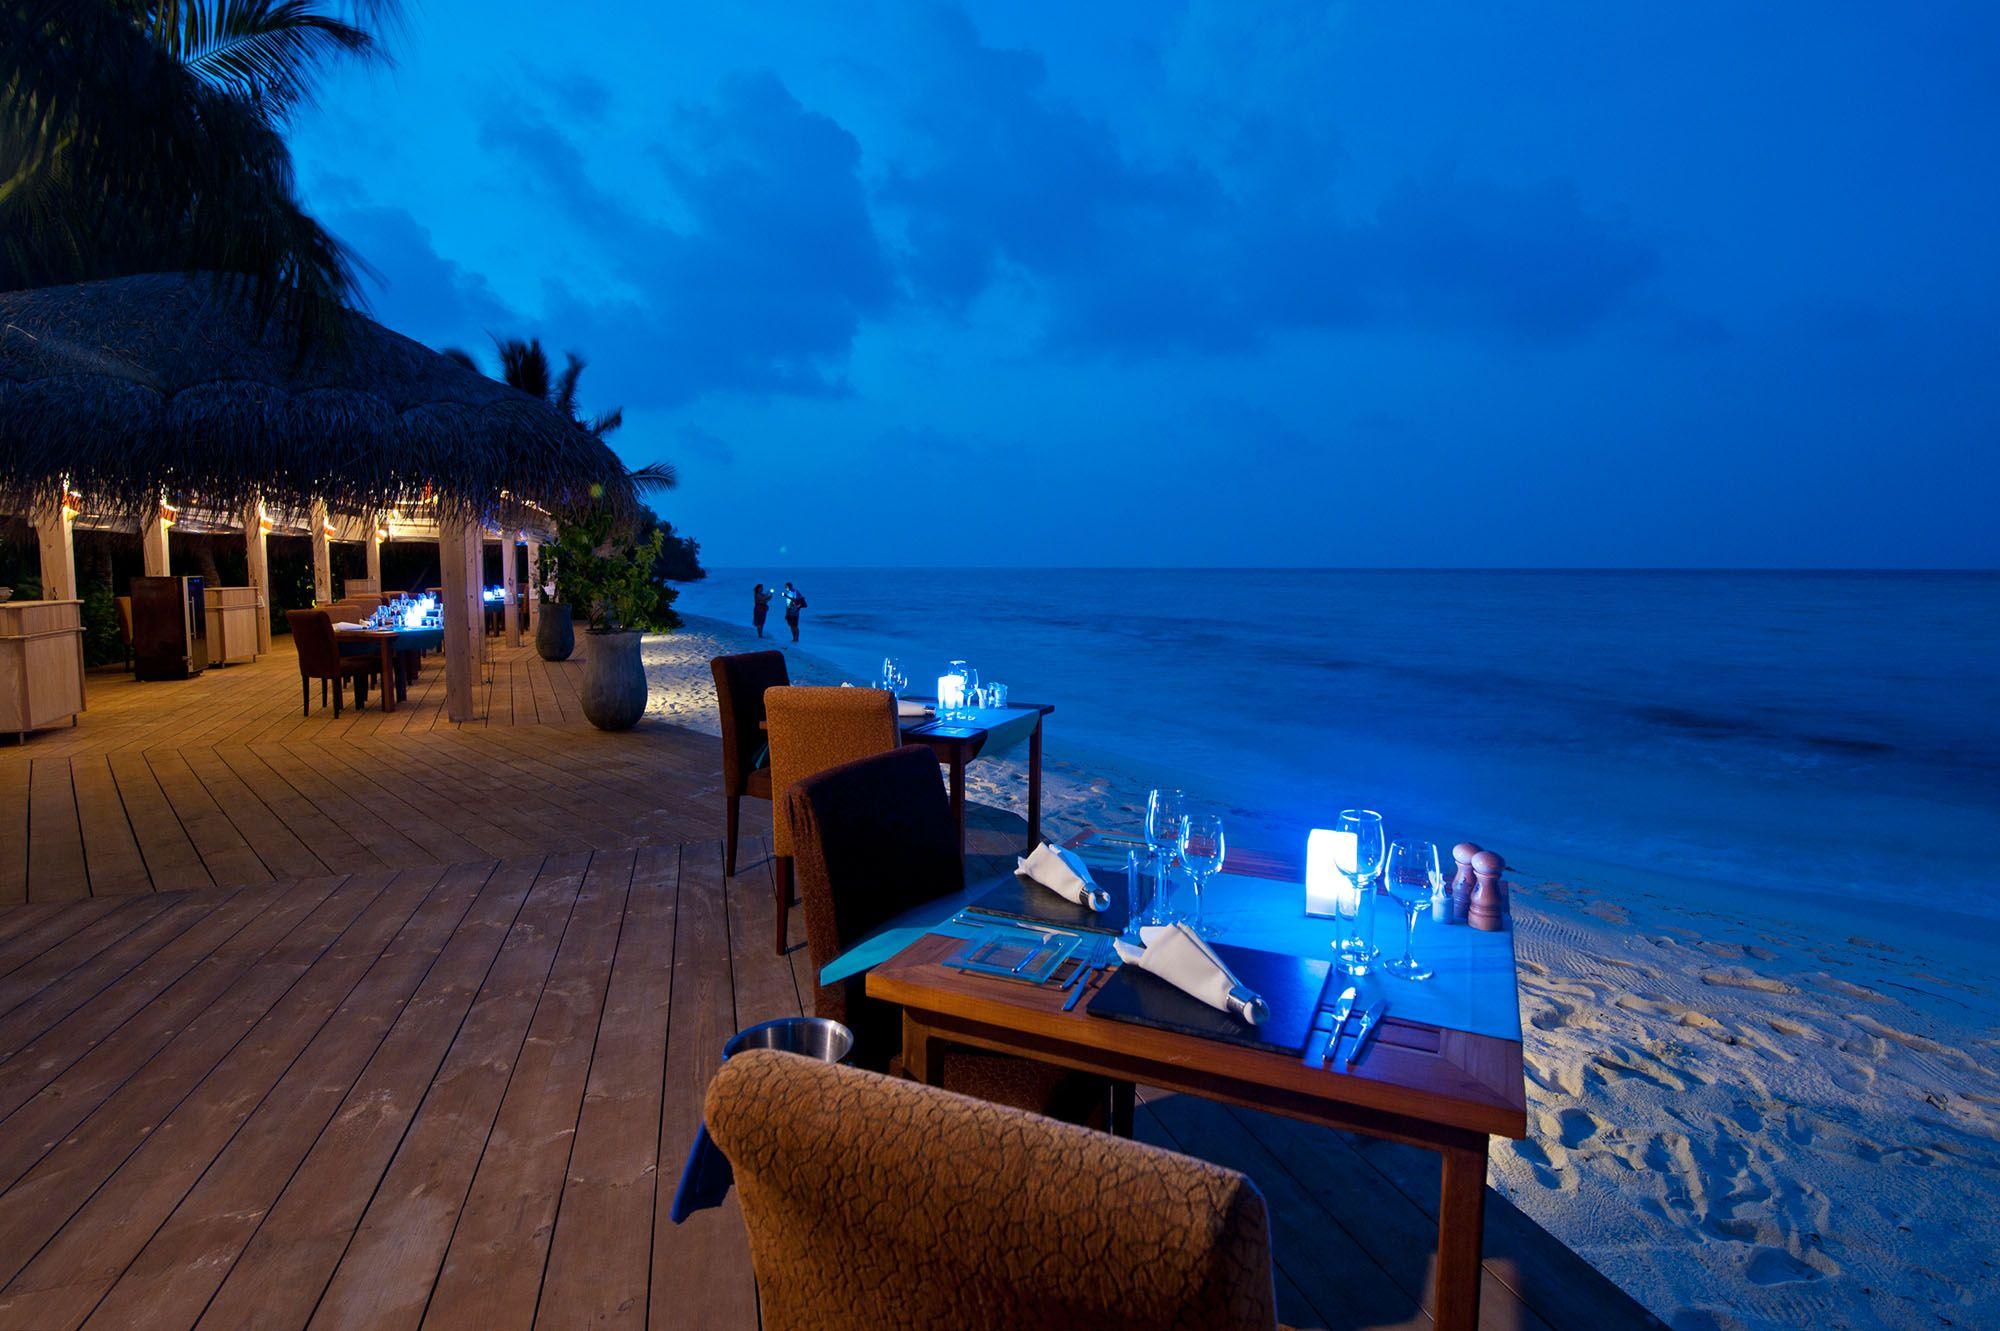 Kuramathi Island Resort In The Maldives 55 Romantic Beach Getaways Beach At Night Island Resort